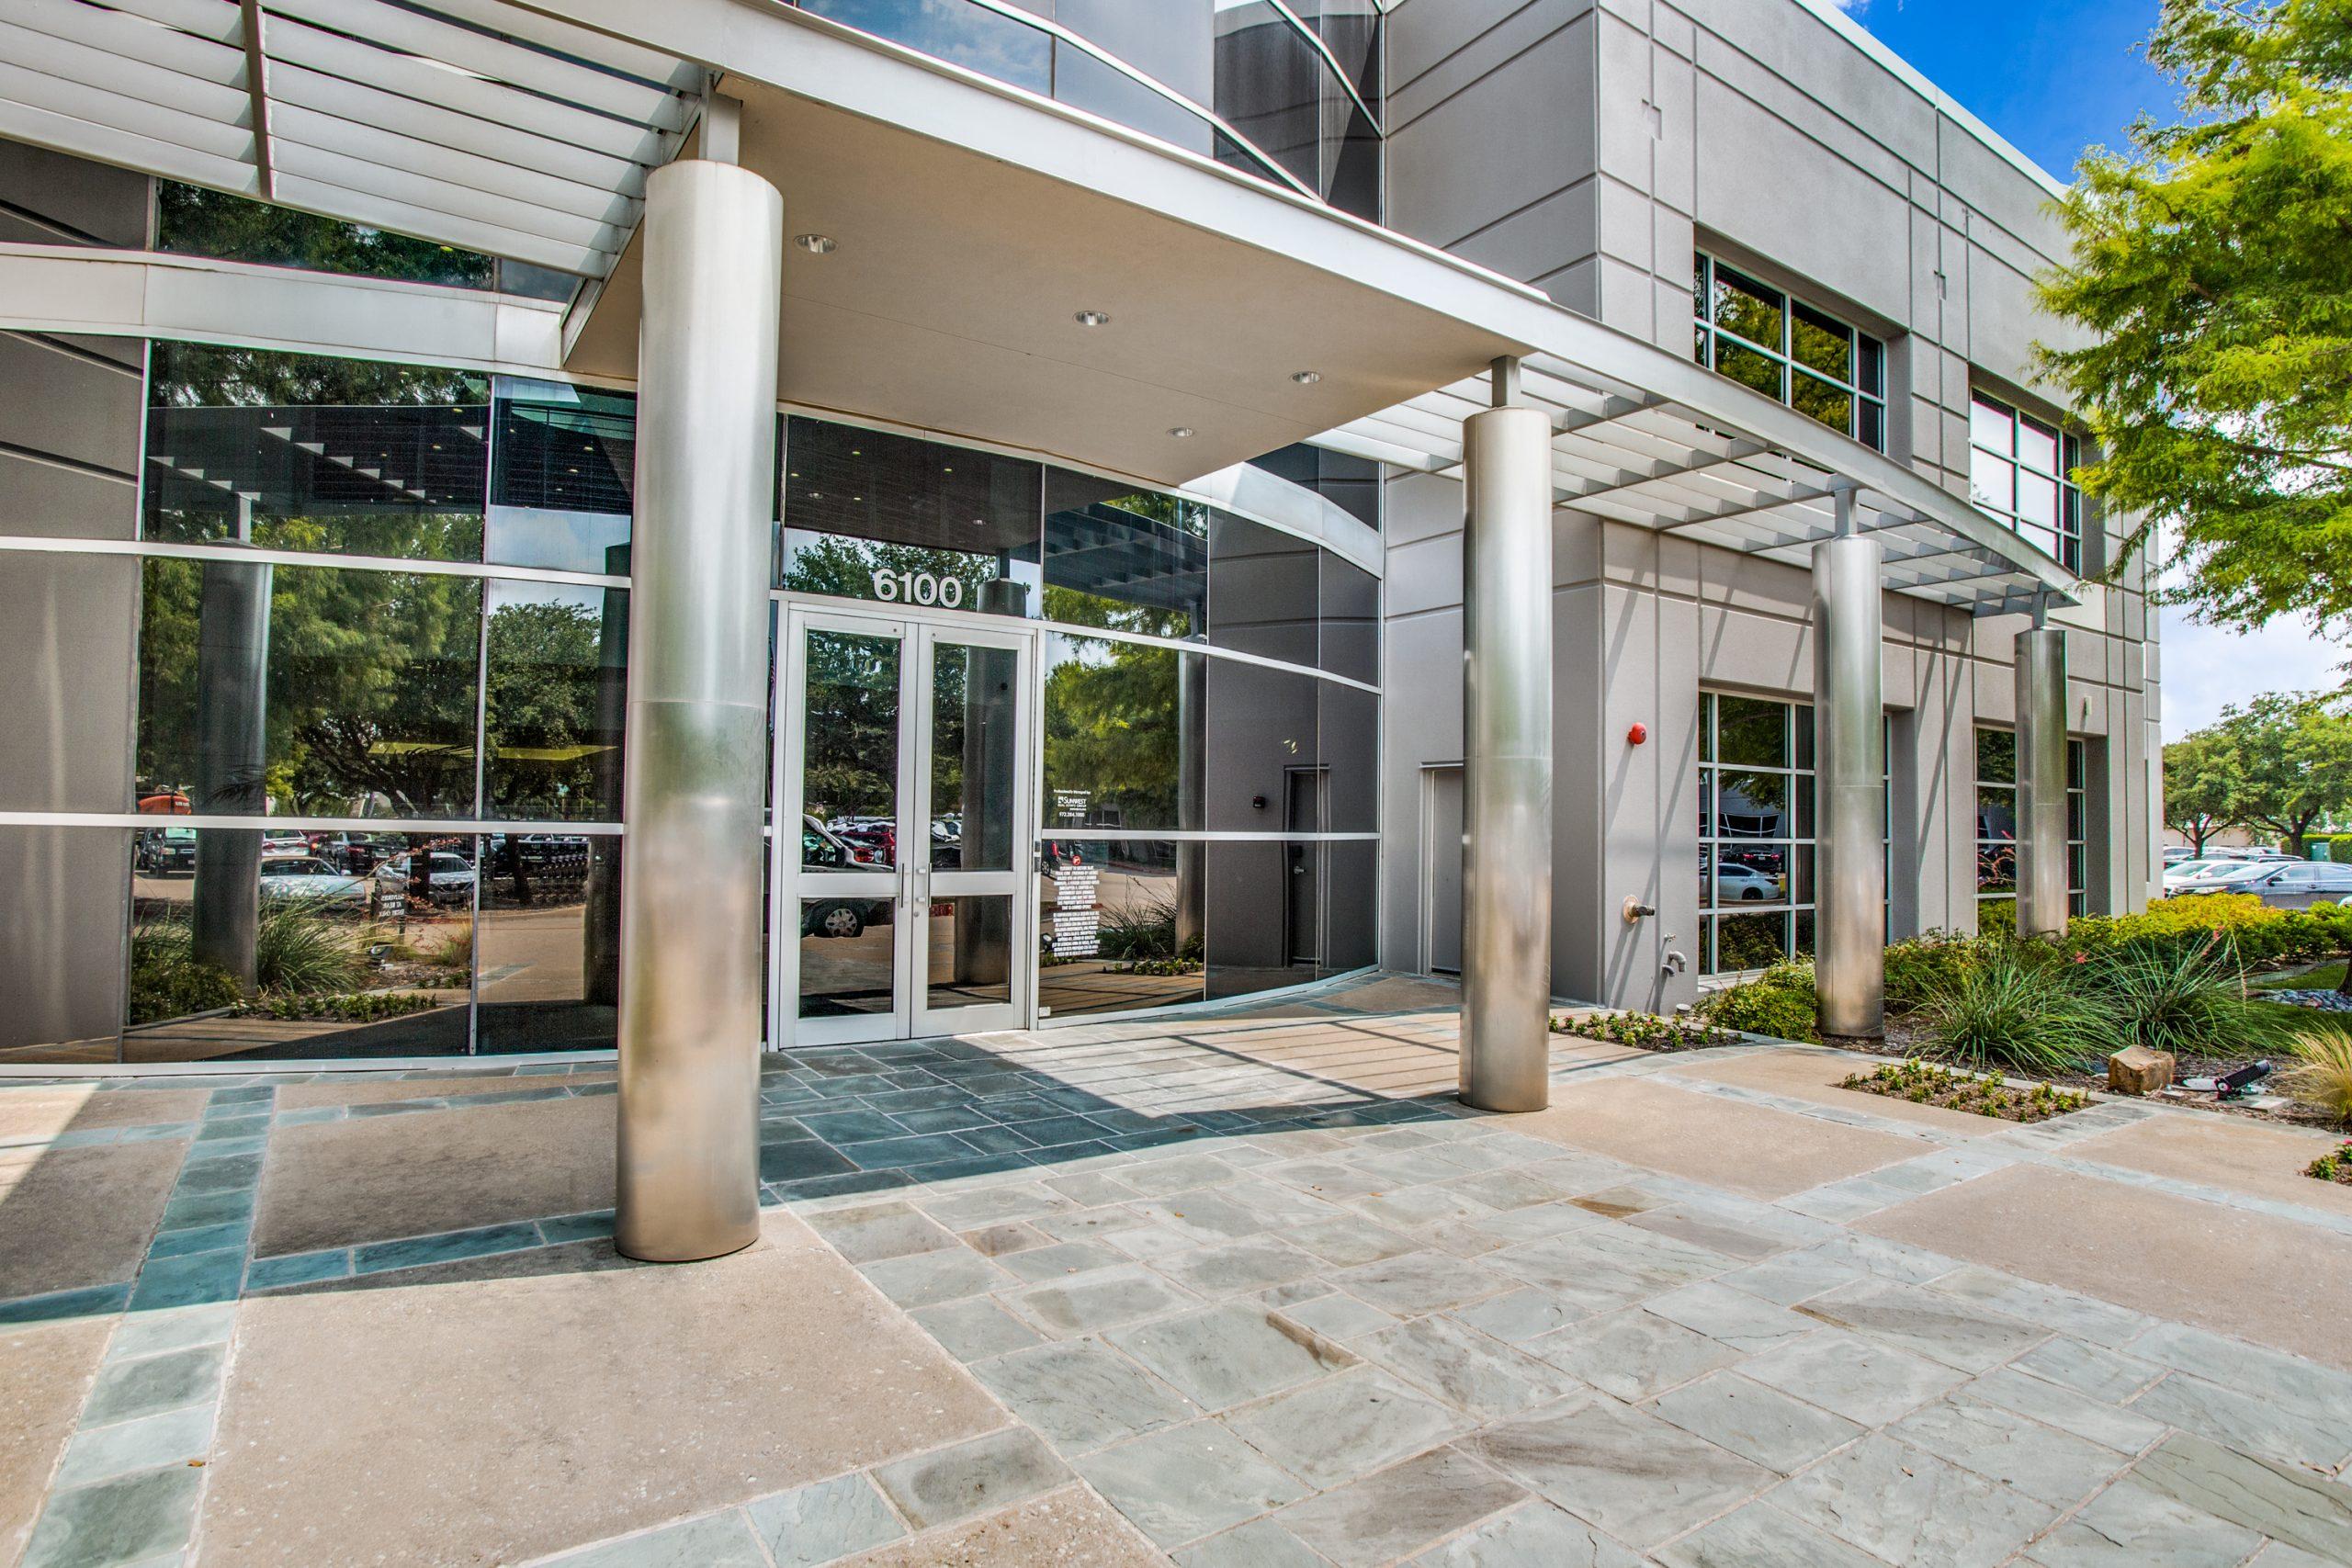 6100 Building Entrance